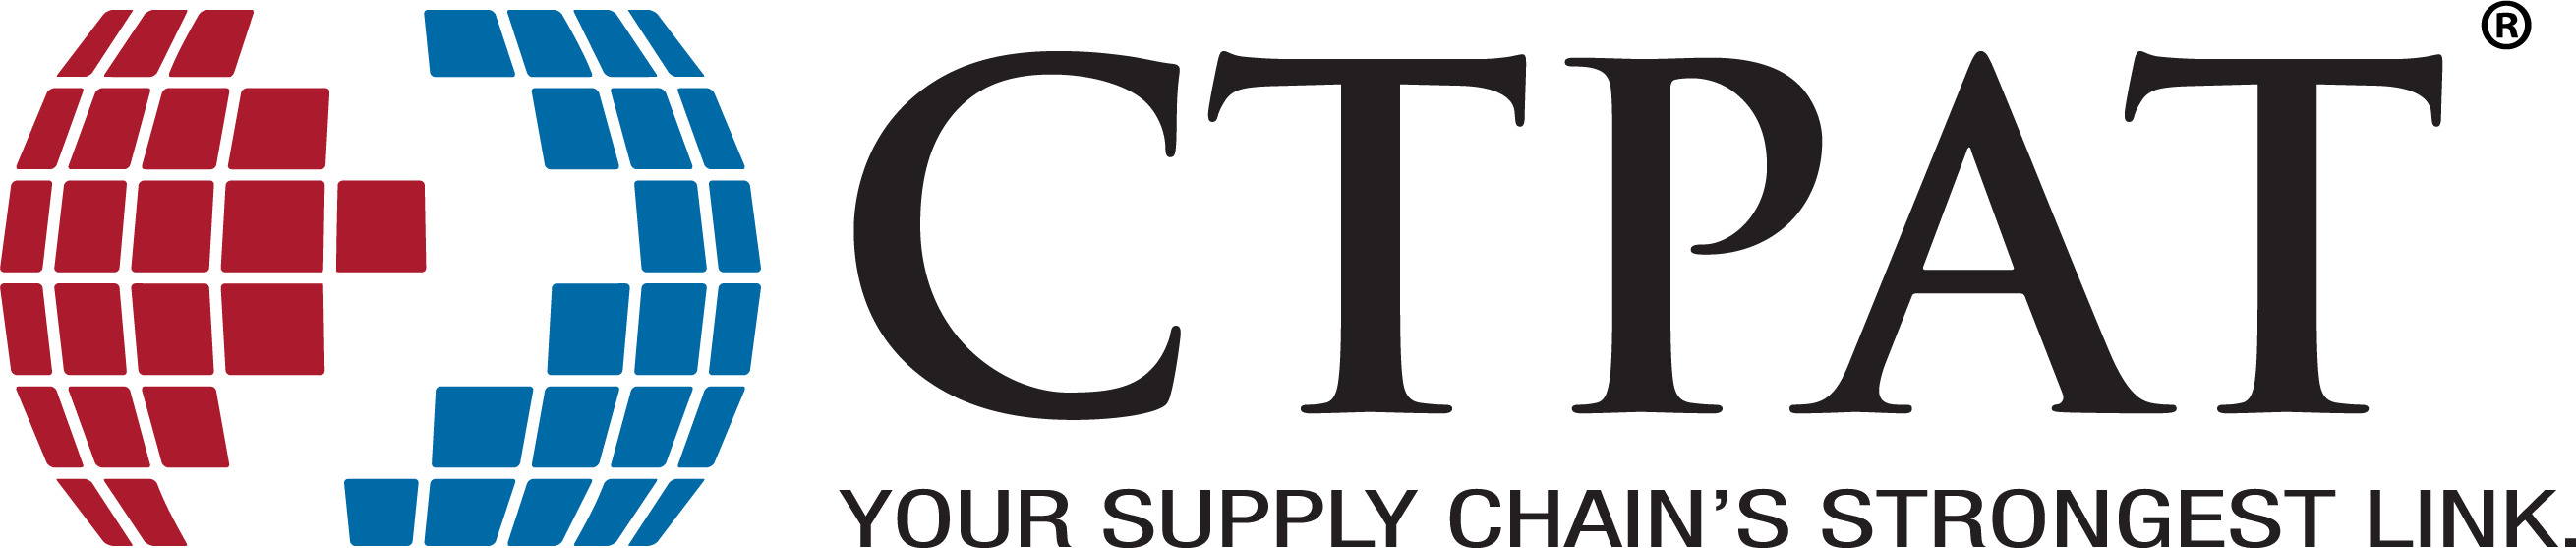 Customs-Trade Partnership Against Terrorism (C-TPAT) logo